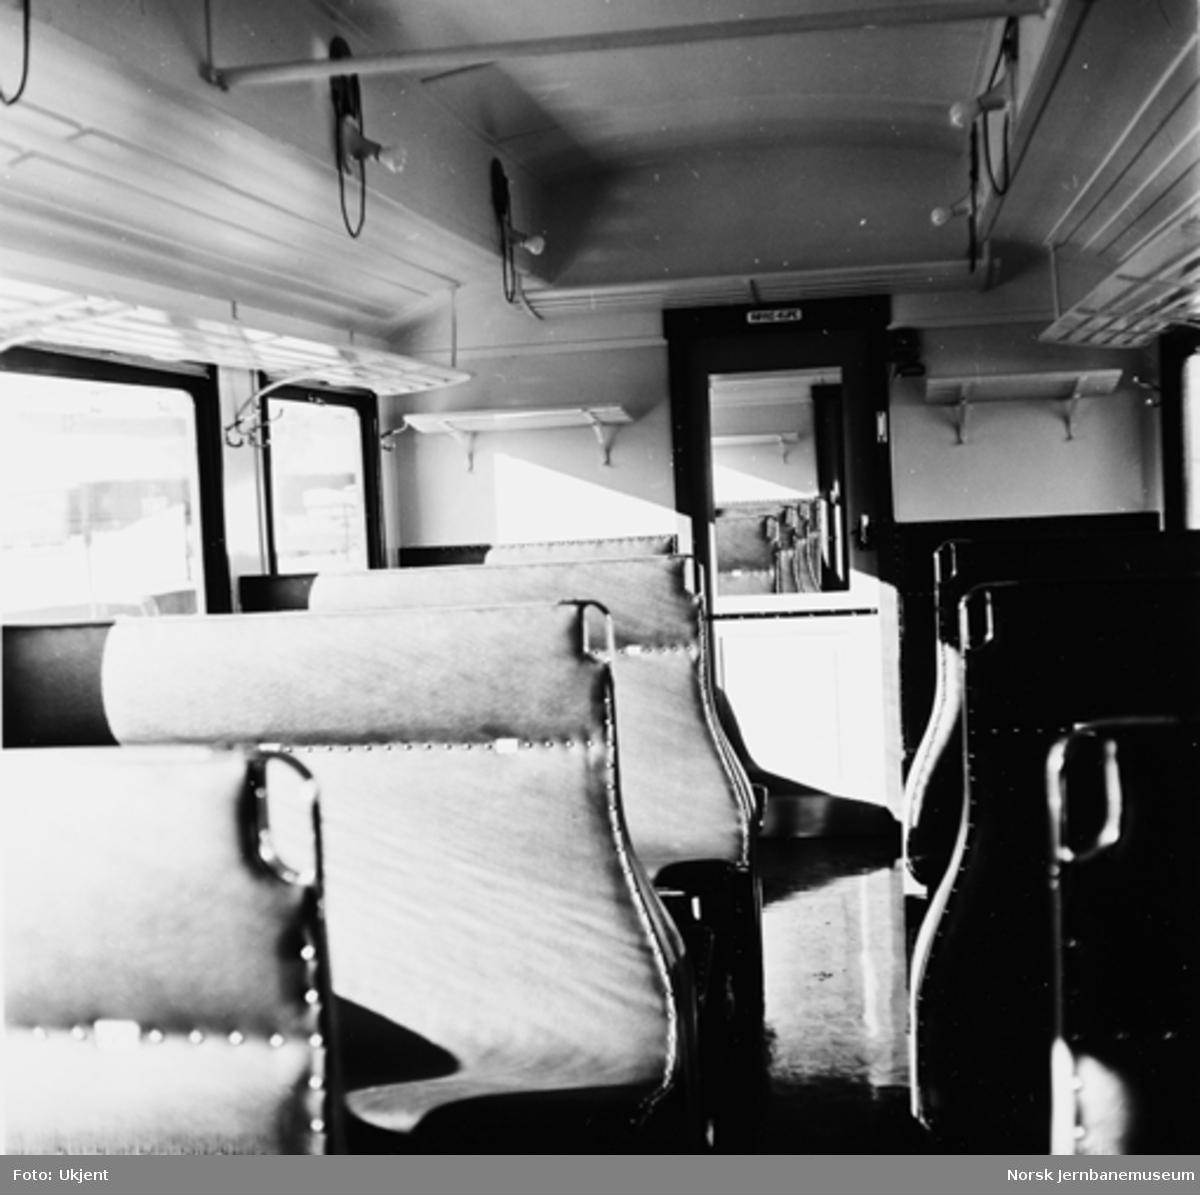 Interiør fra smalsporet personvogn